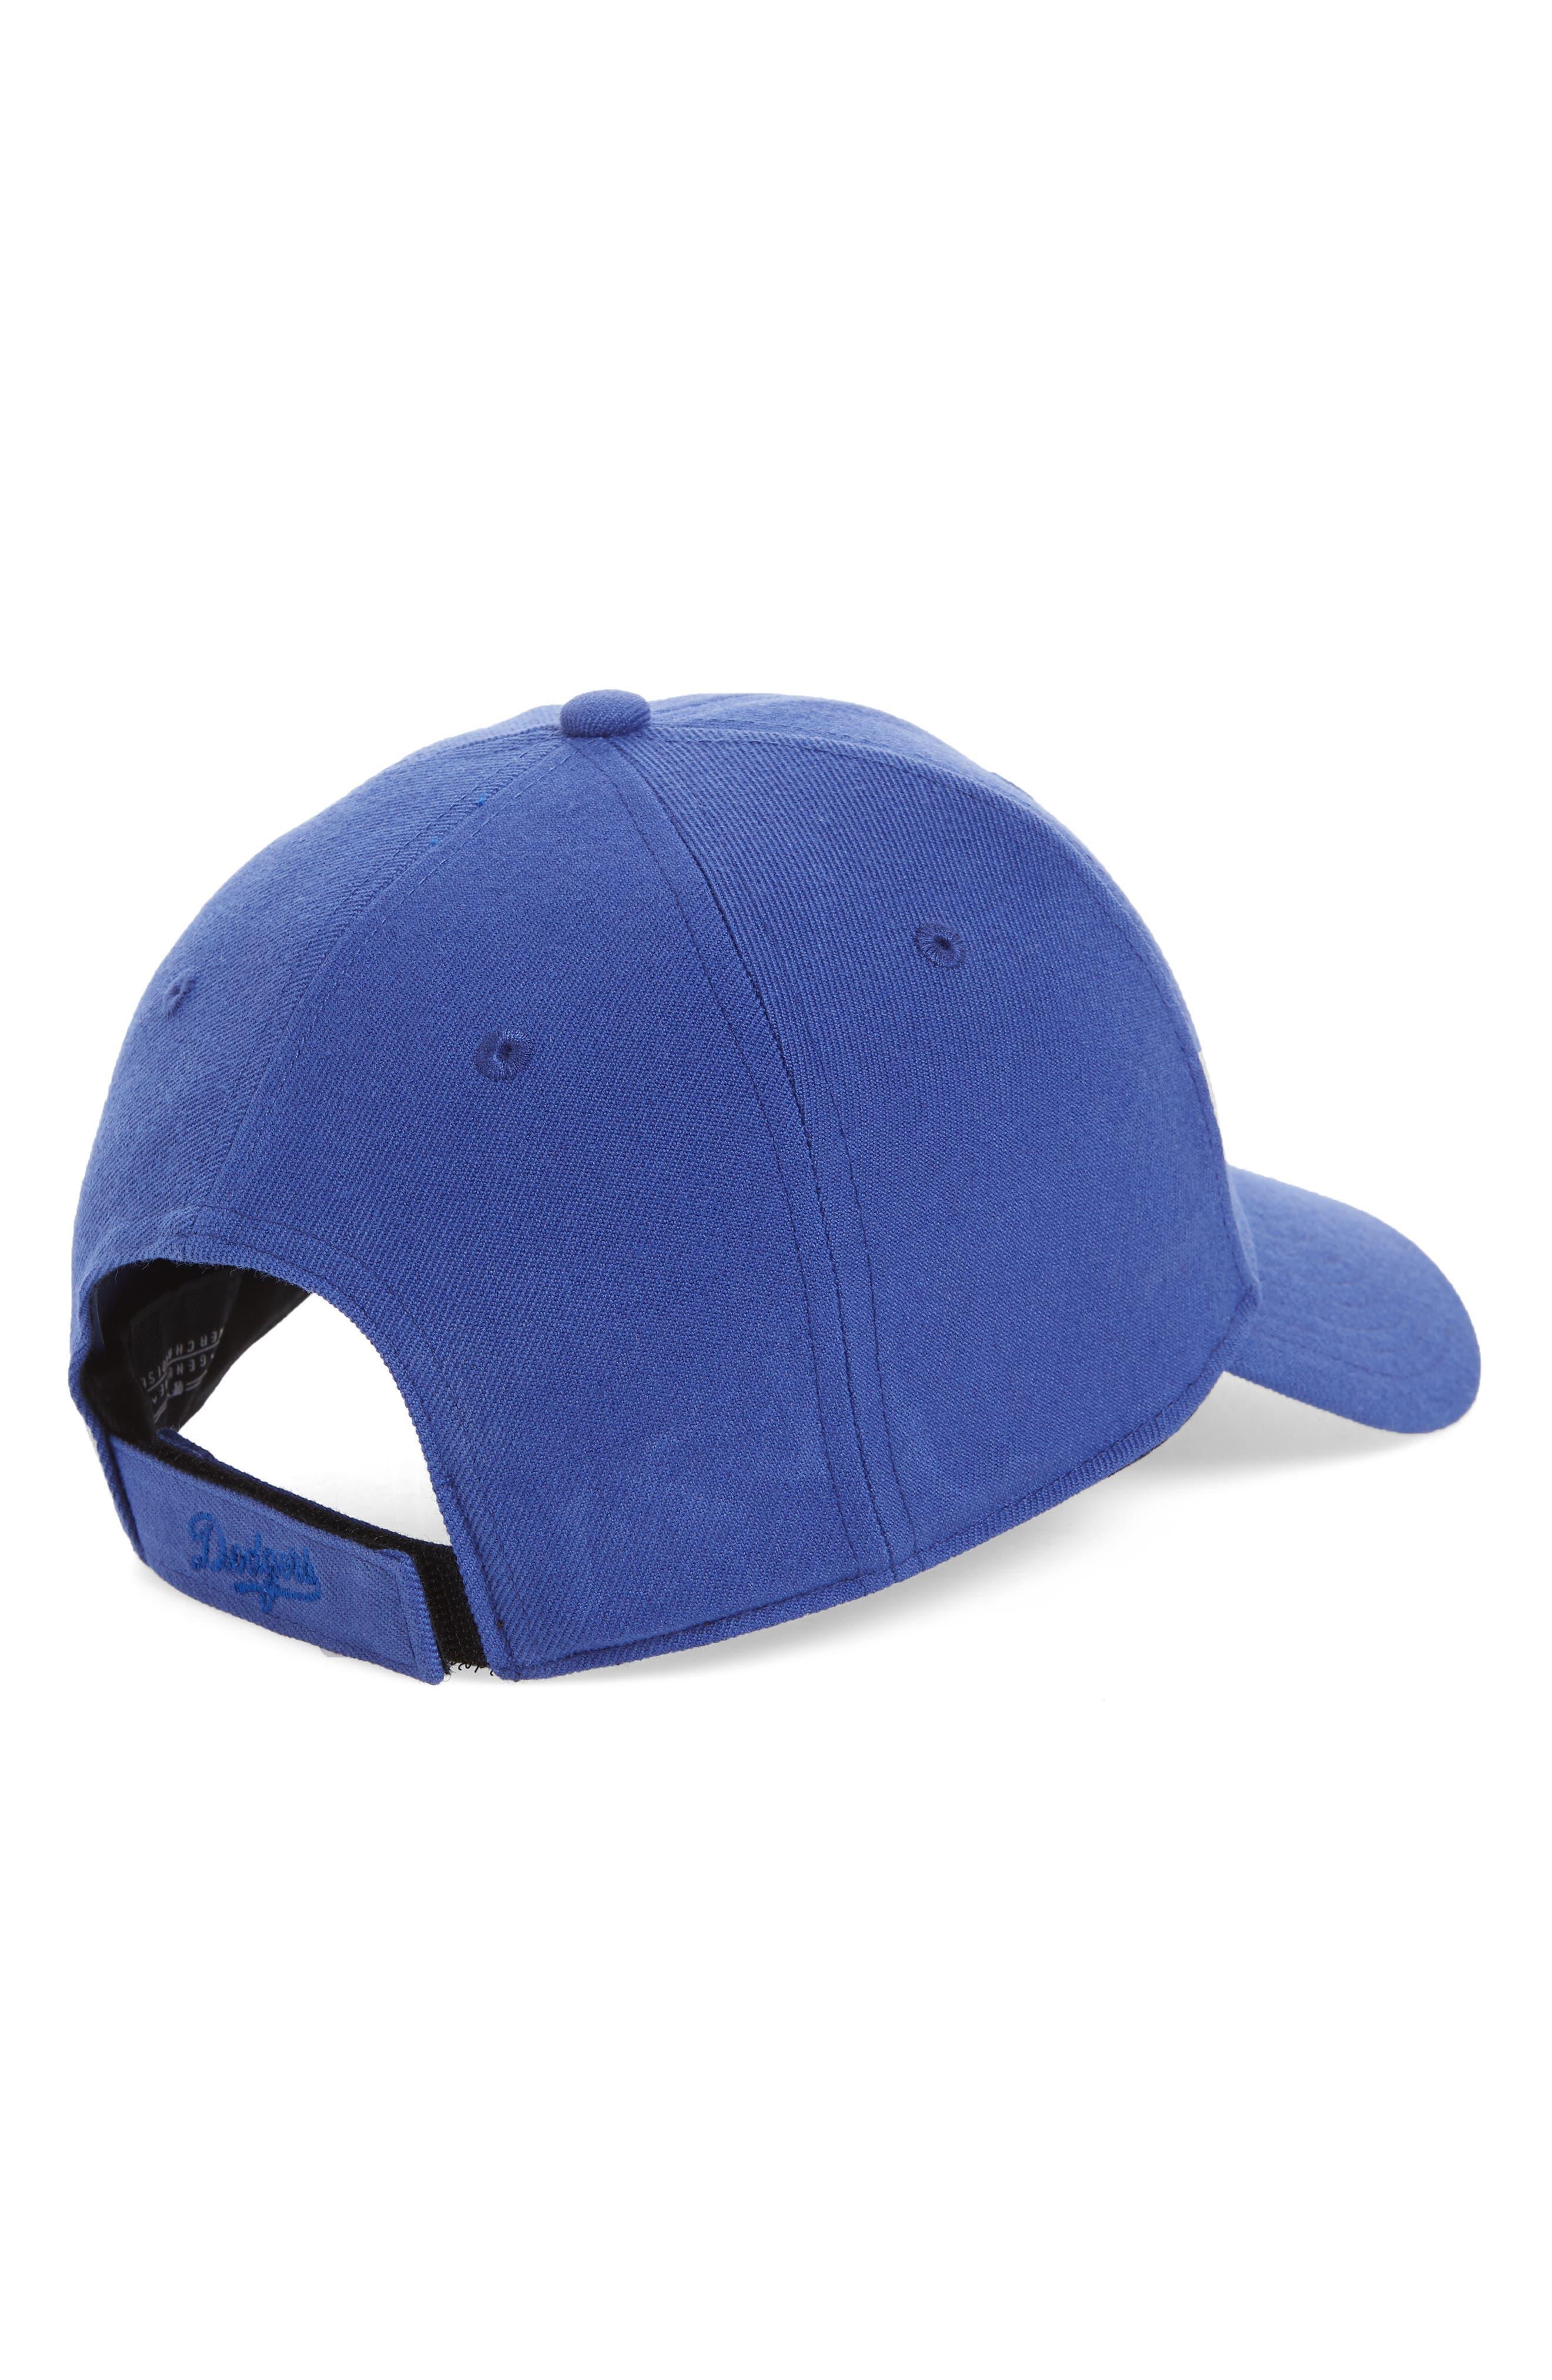 MVP LA Dodgers Baseball Cap,                             Alternate thumbnail 2, color,                             Royal